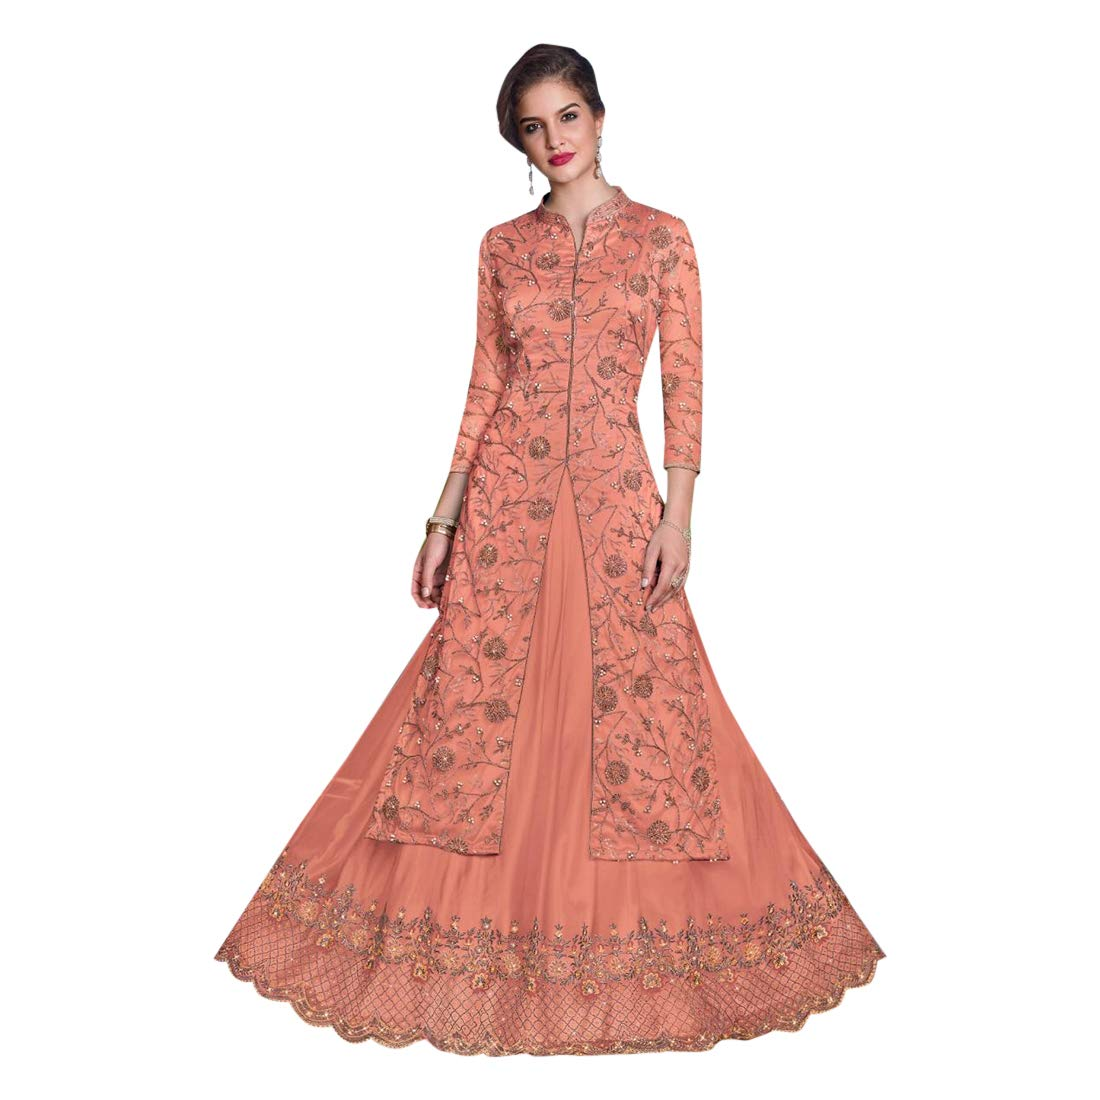 Peach Designer Party Skirt style Gown Salwar Kameez suit Dupatta for Women Ethnic Indian Muslim dress 7708